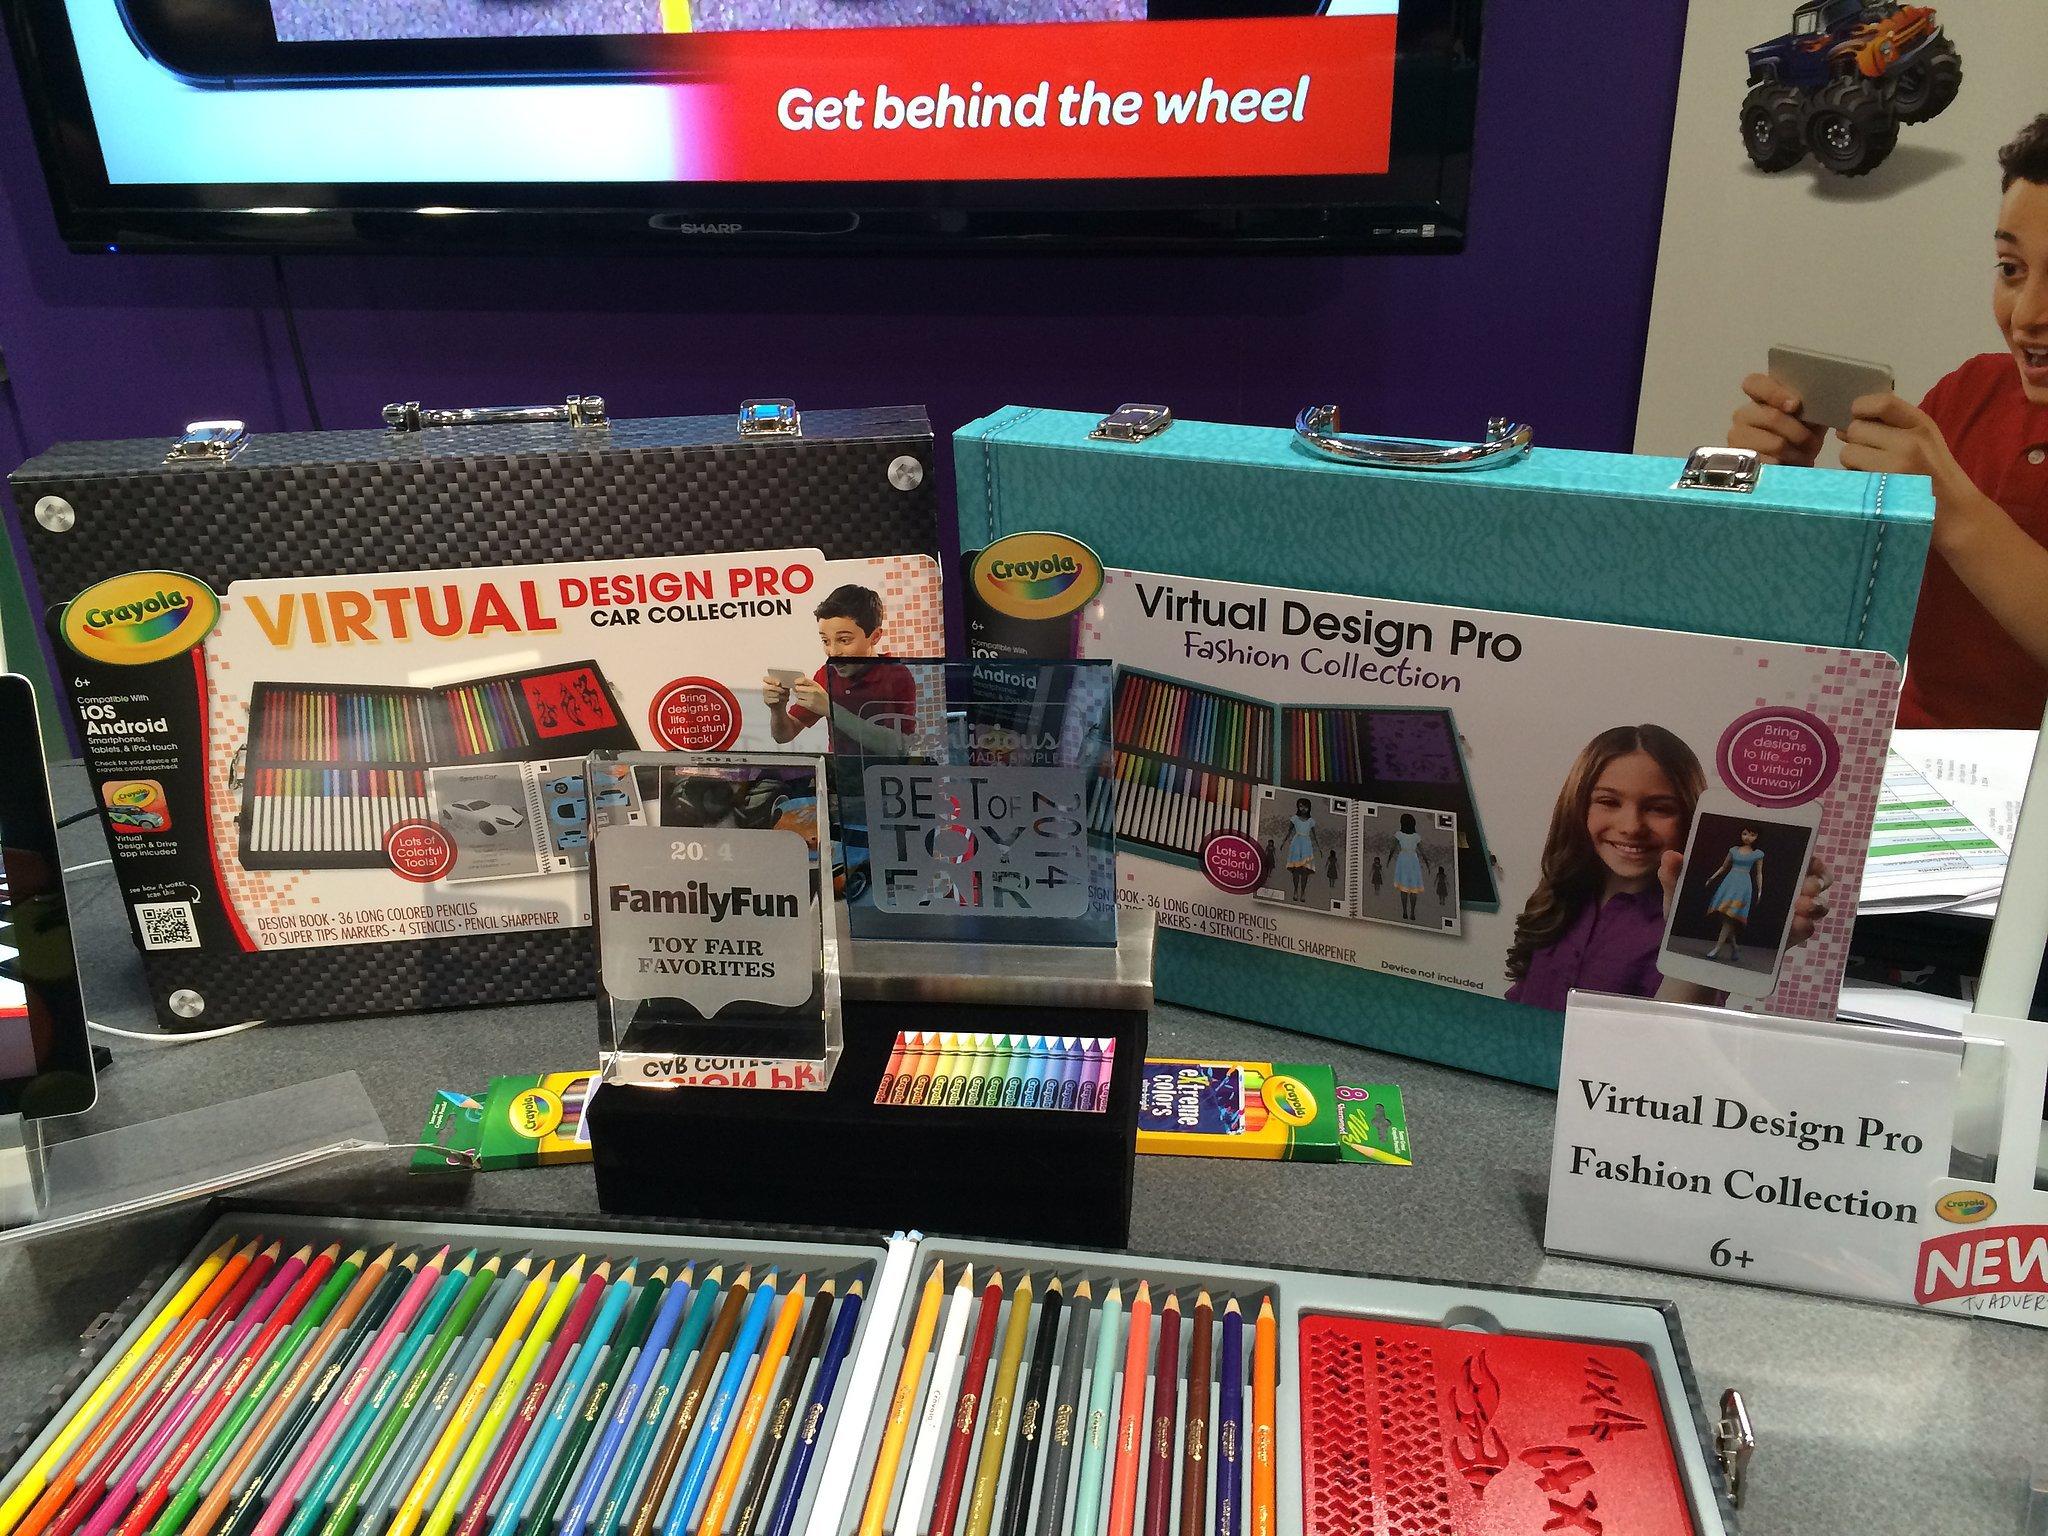 Crayola Virtual Design Pro